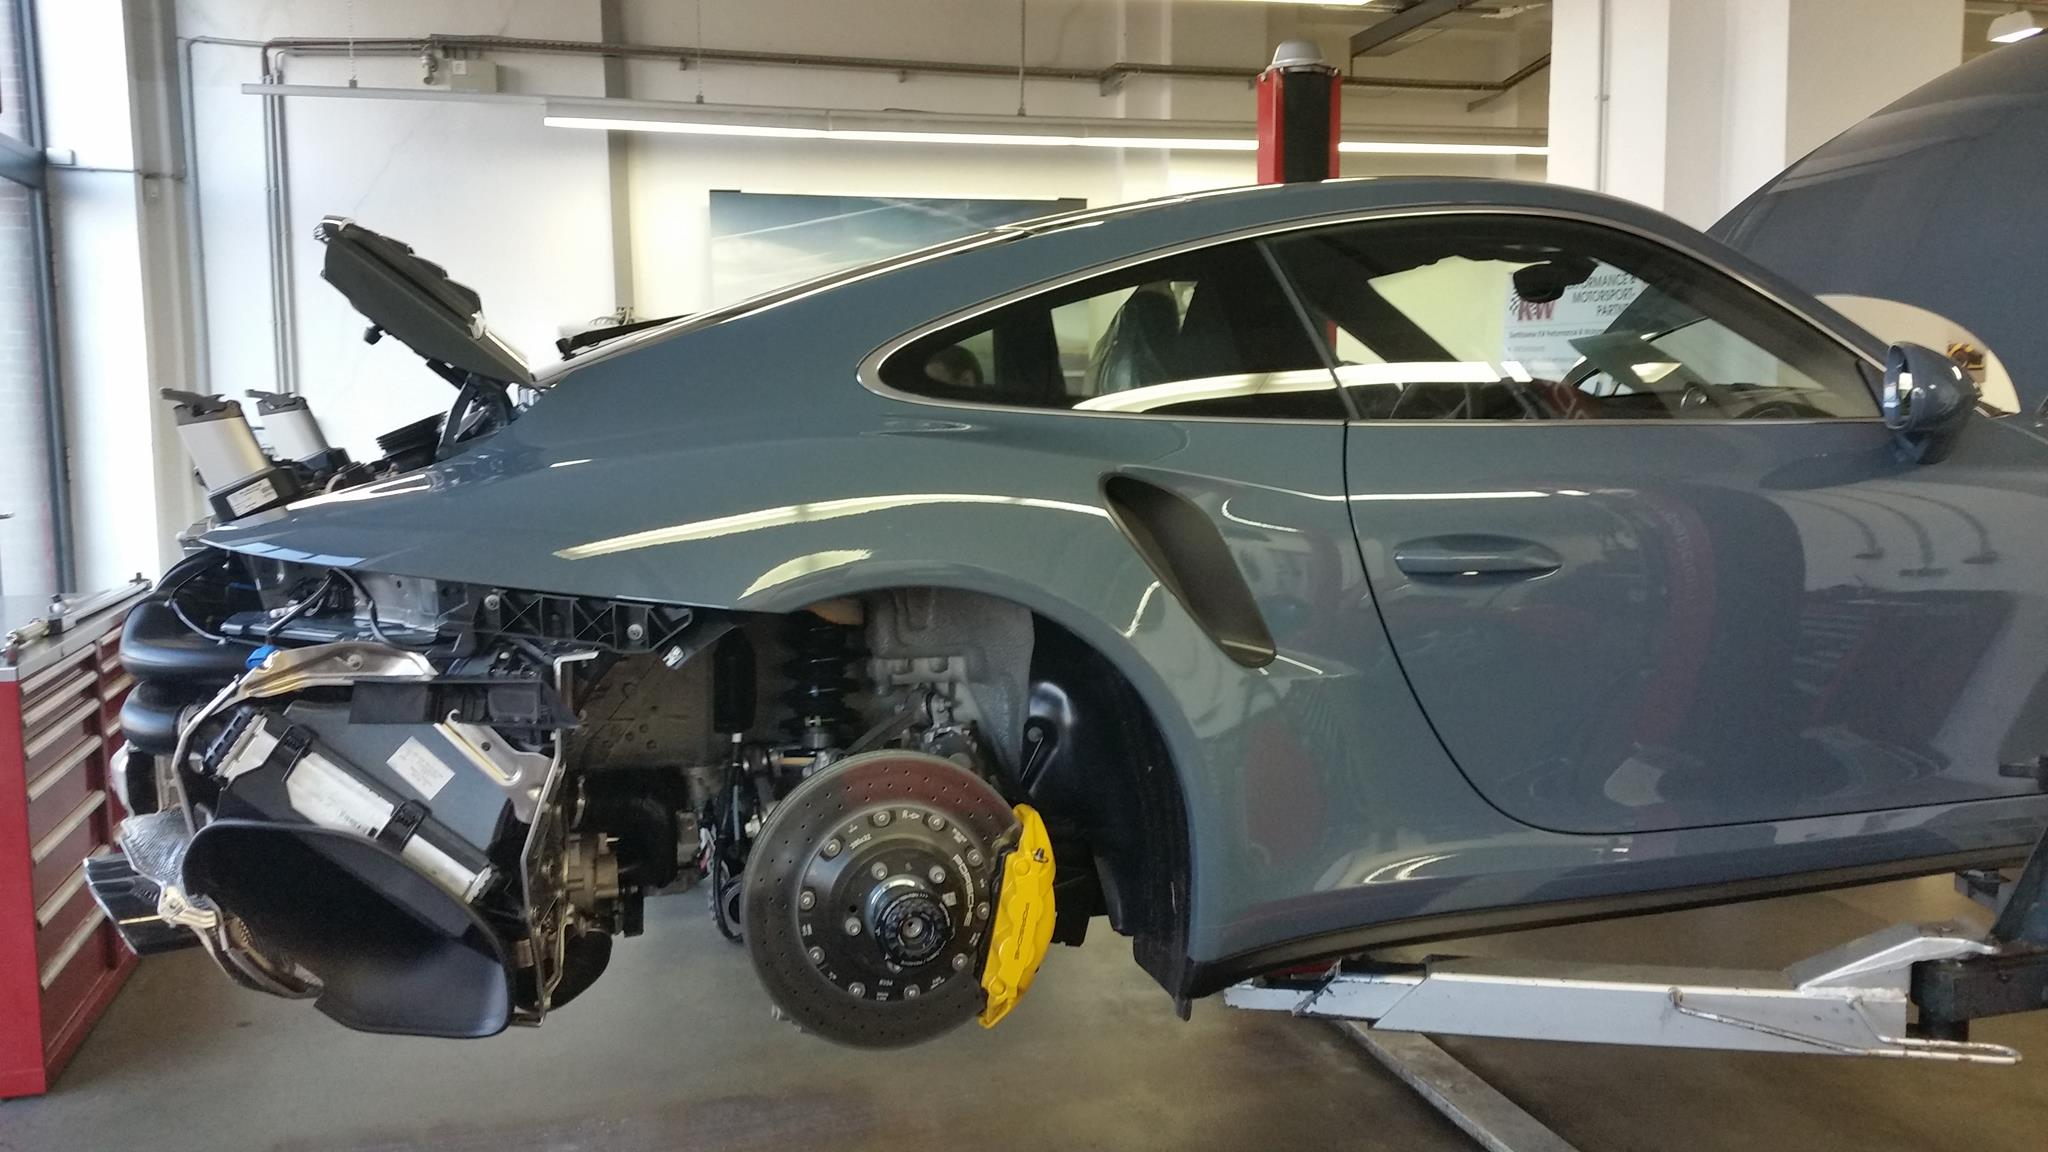 2017 Porsche Panamera Spec >> 2017 Porsche 911 Turbo S Loses Bumpers in Striptease, Looks Mechanically Superb - autoevolution